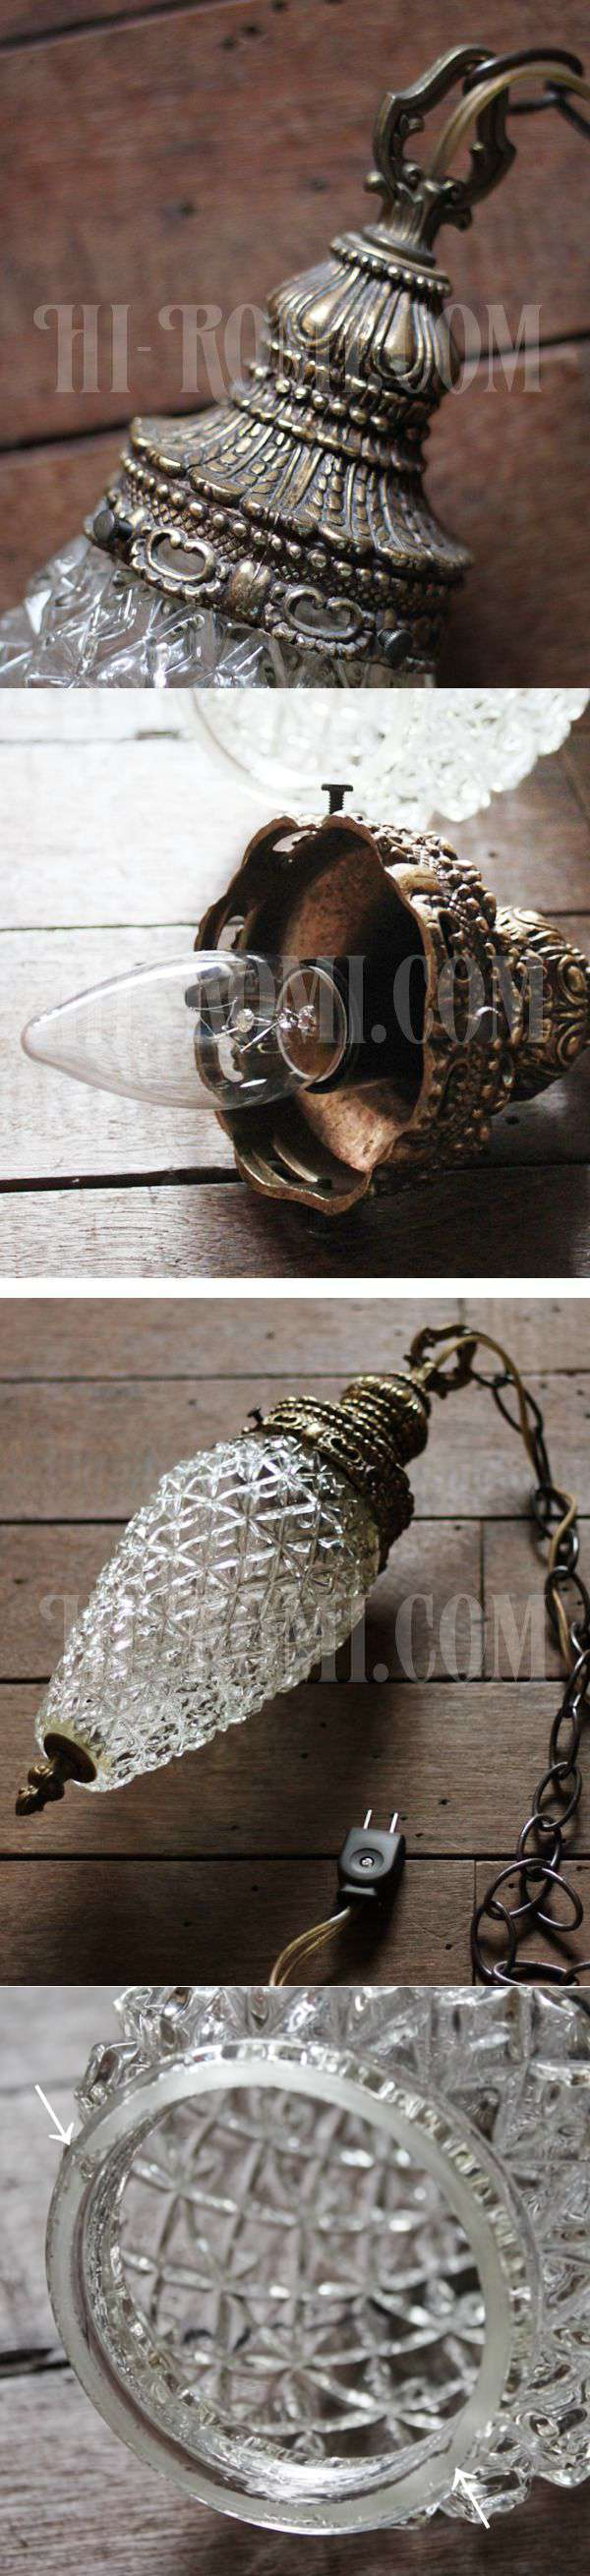 USAヴィンテージクリアプレスガラススワッグペンダントランプ/アンティークハンギング吊下げライト/ダイヤ型